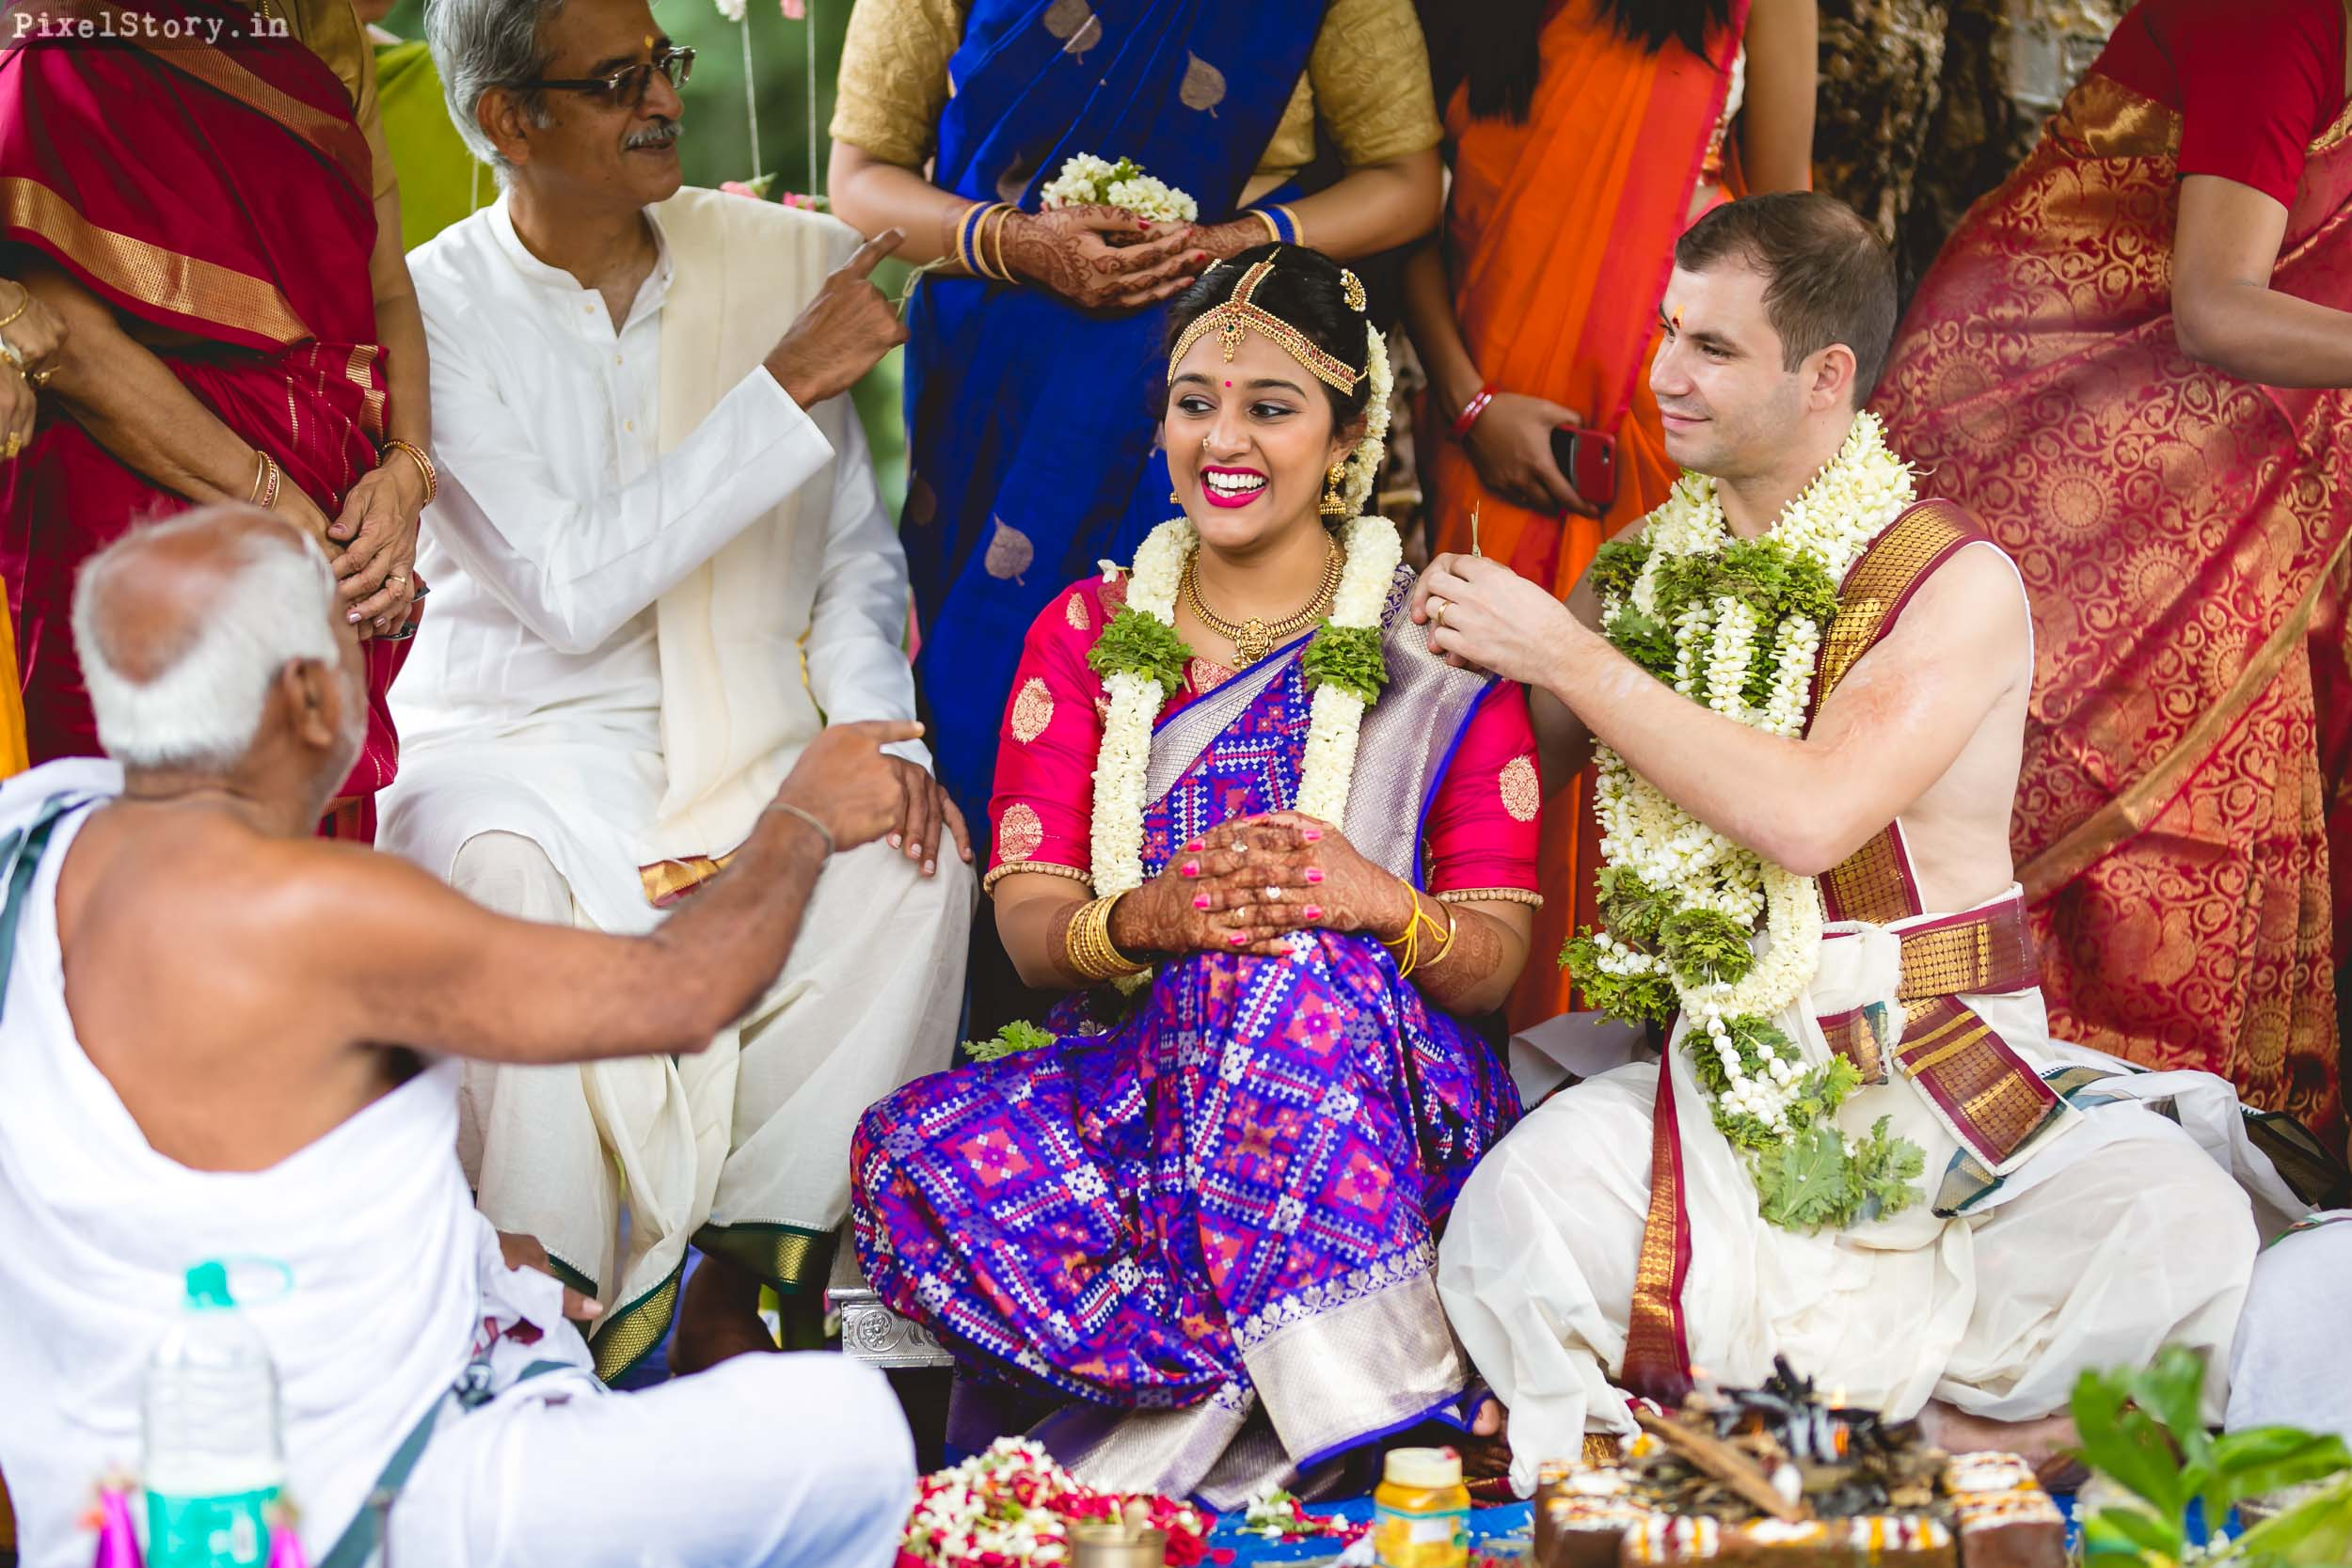 PixelStory-Jungle-Wedding-Photographer-Masinagudi-Indo-French062.jpg